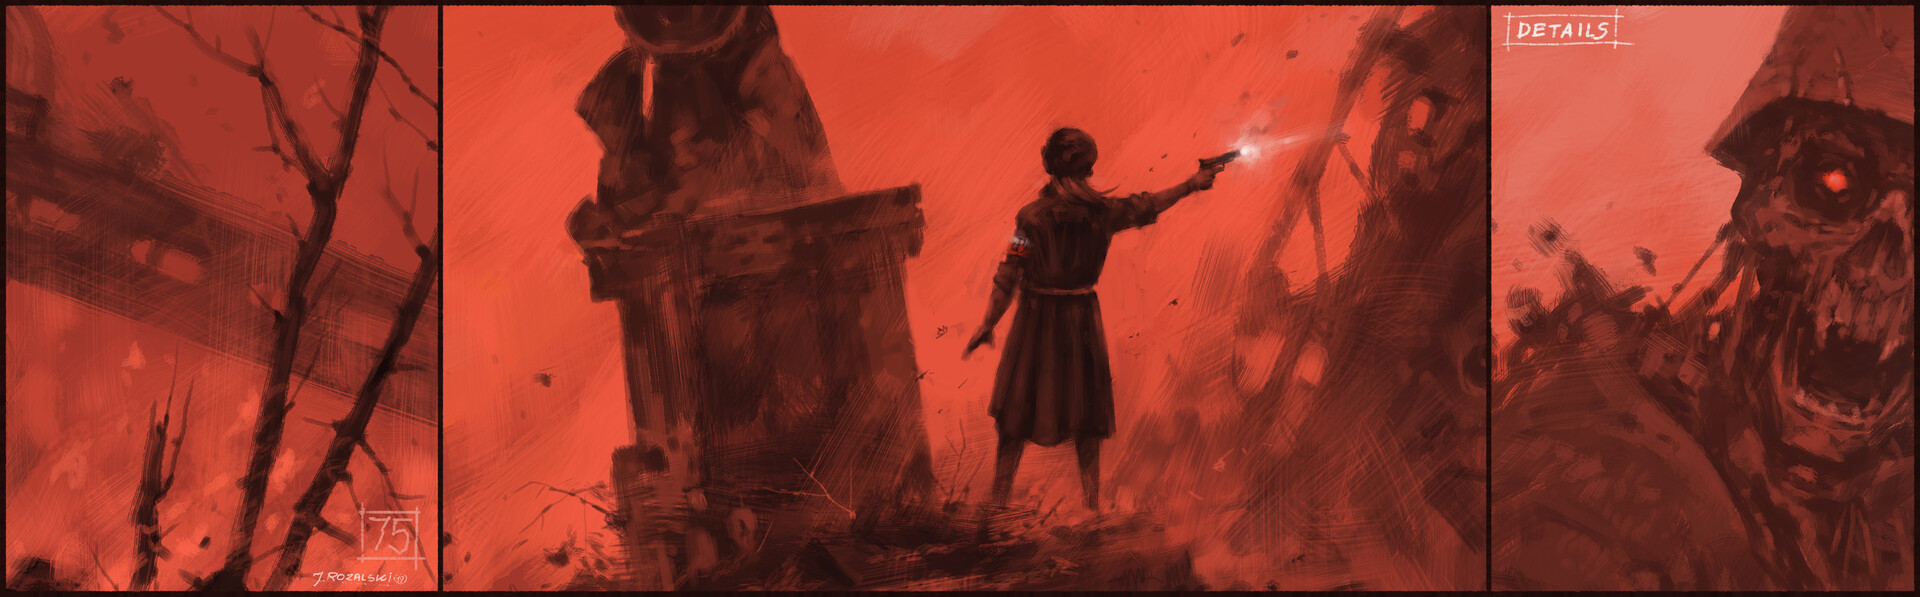 Jakub rozalski warsaw uprising75yearsago process3